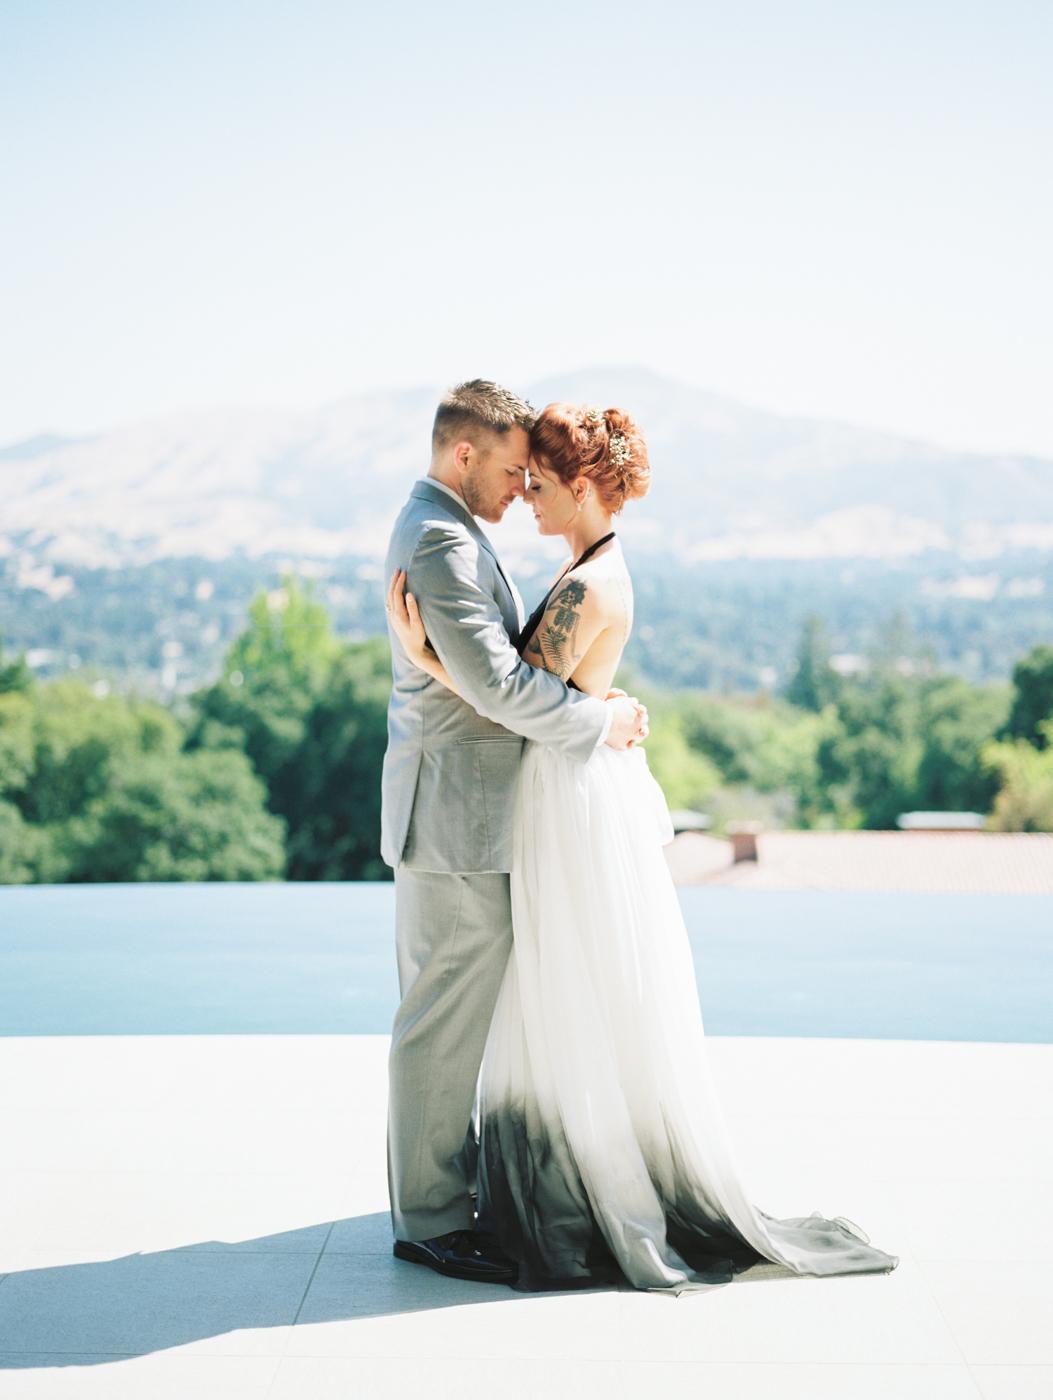 Kipp Emily s Intimate Private Estate Wedding-Kipp Emily GWS-0237.jpg